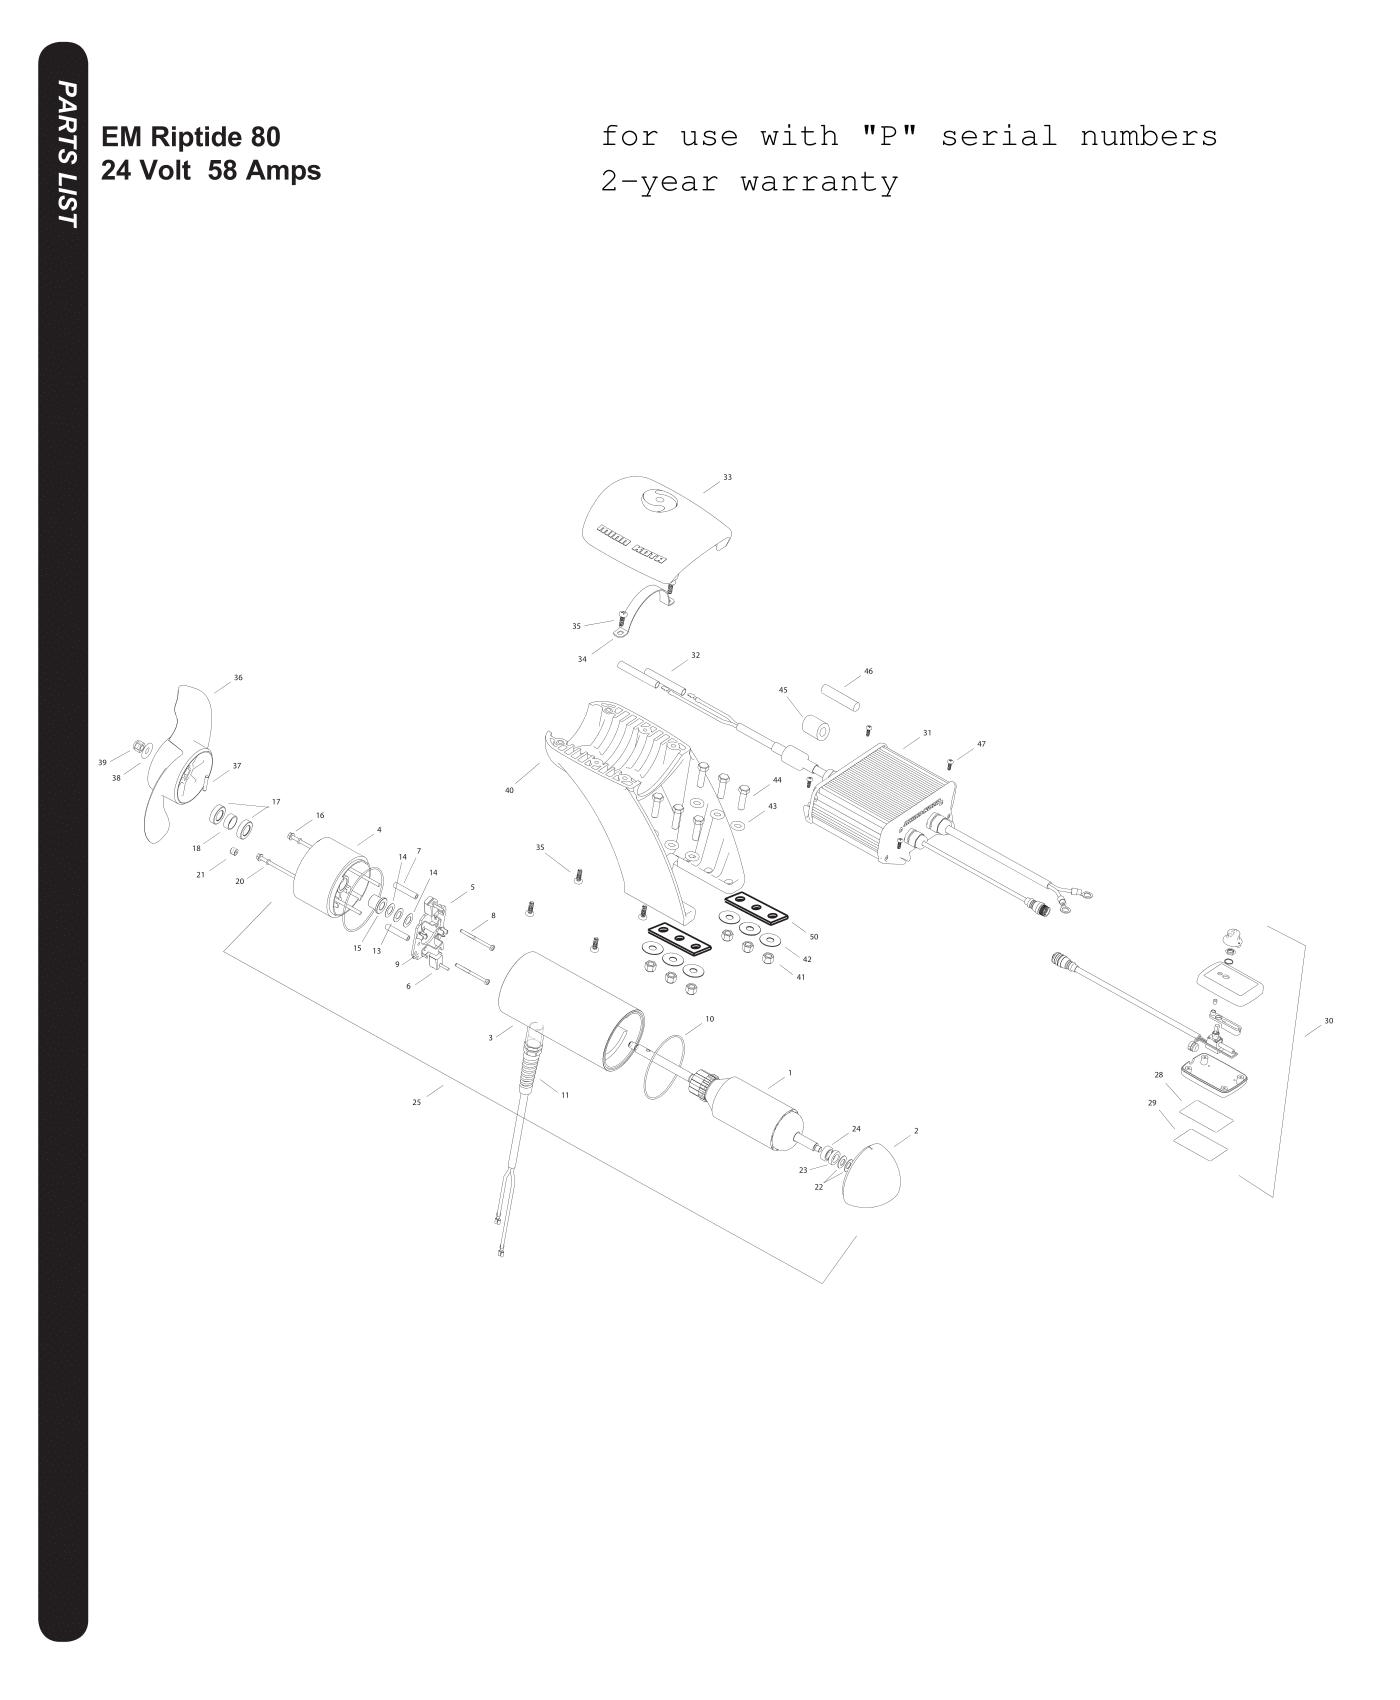 2015-mk-riptideem80-1.png